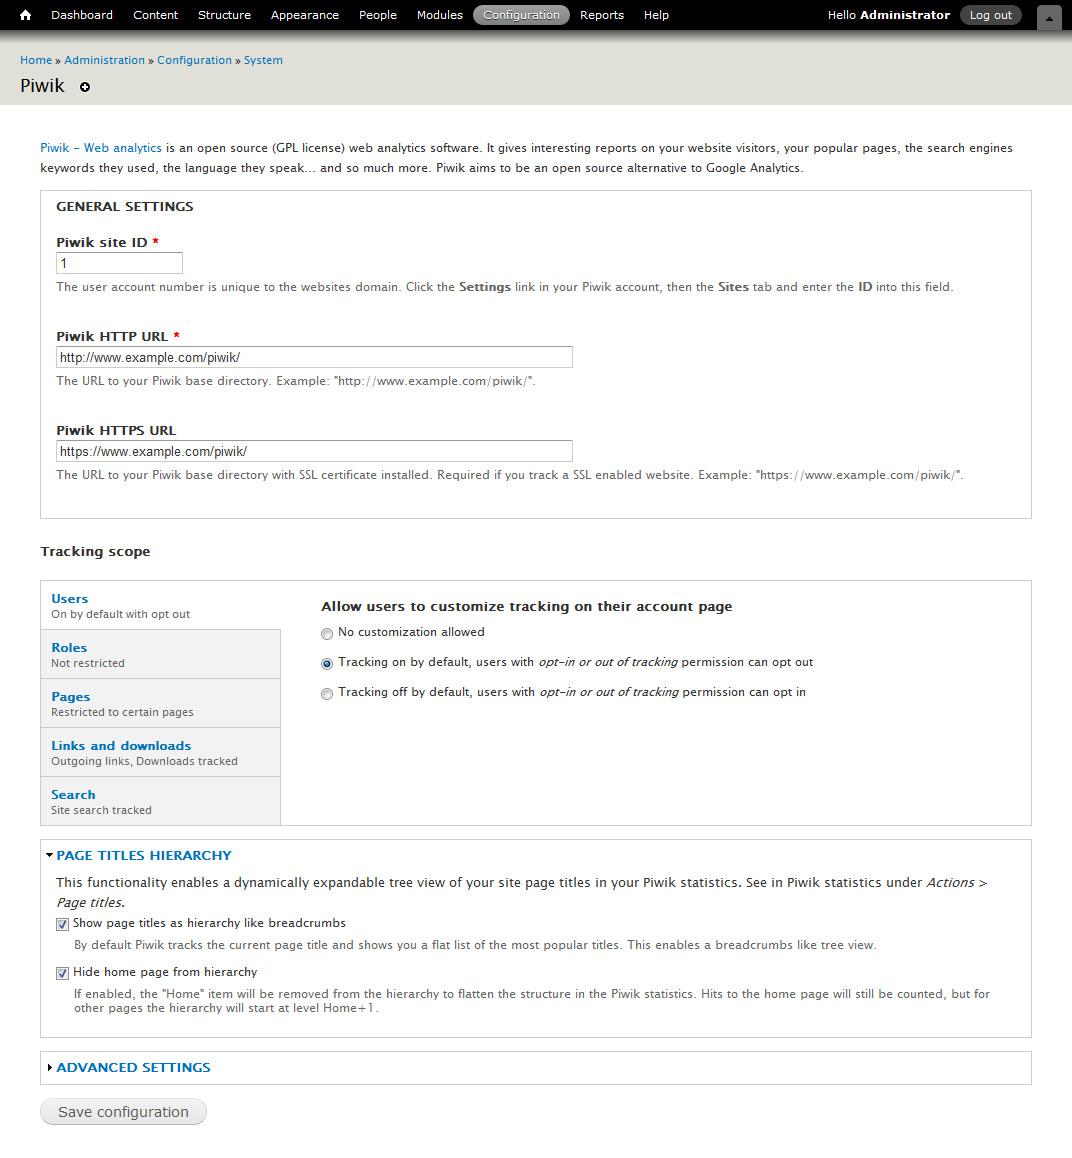 SEO: Modulo Drupal 7 per Piwik